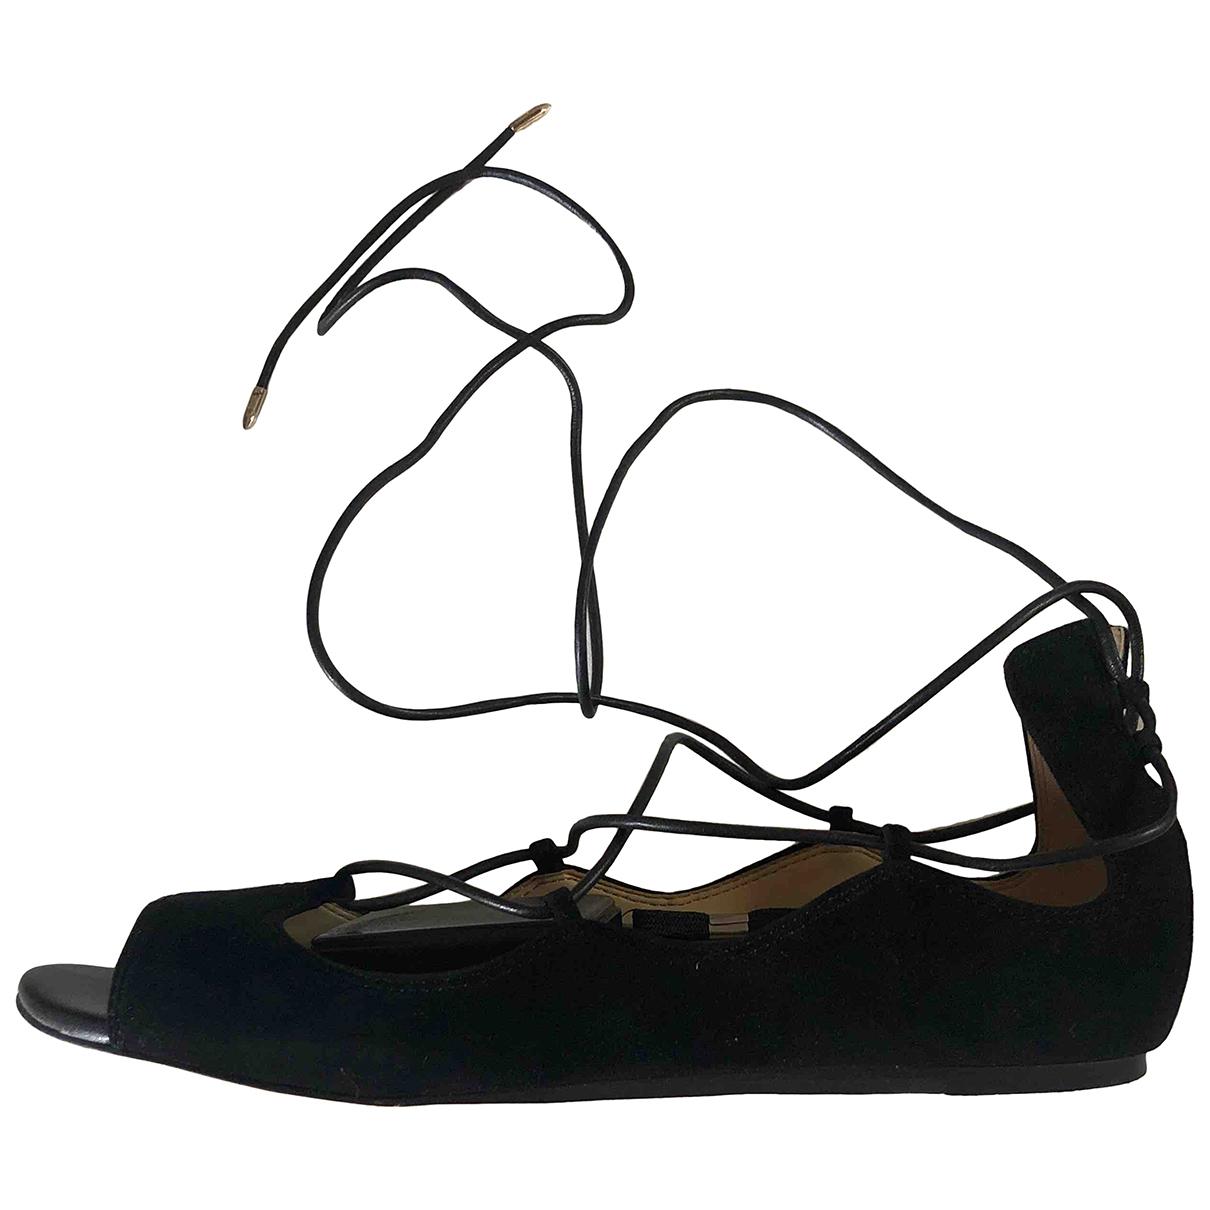 Sam Edelman \N Black Suede Sandals for Women 7.5 US